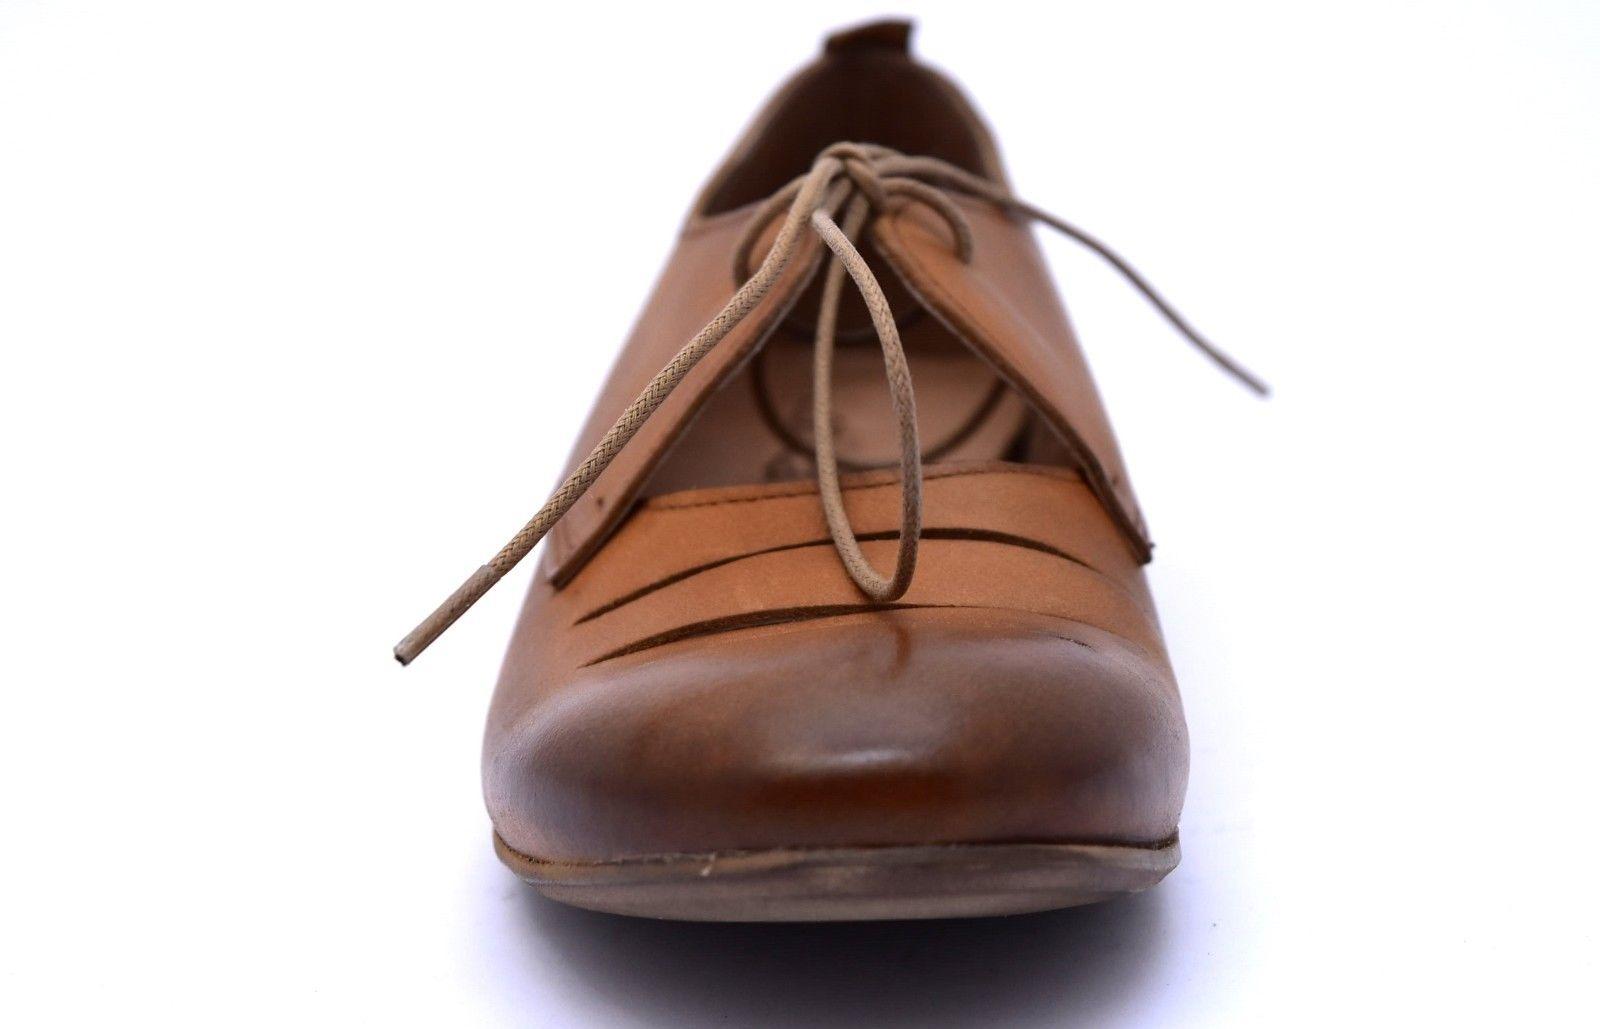 innovative design 2d756 c1dff LATIKA 239 CUOIO Stringate estive donna | shoesmyfriends.it